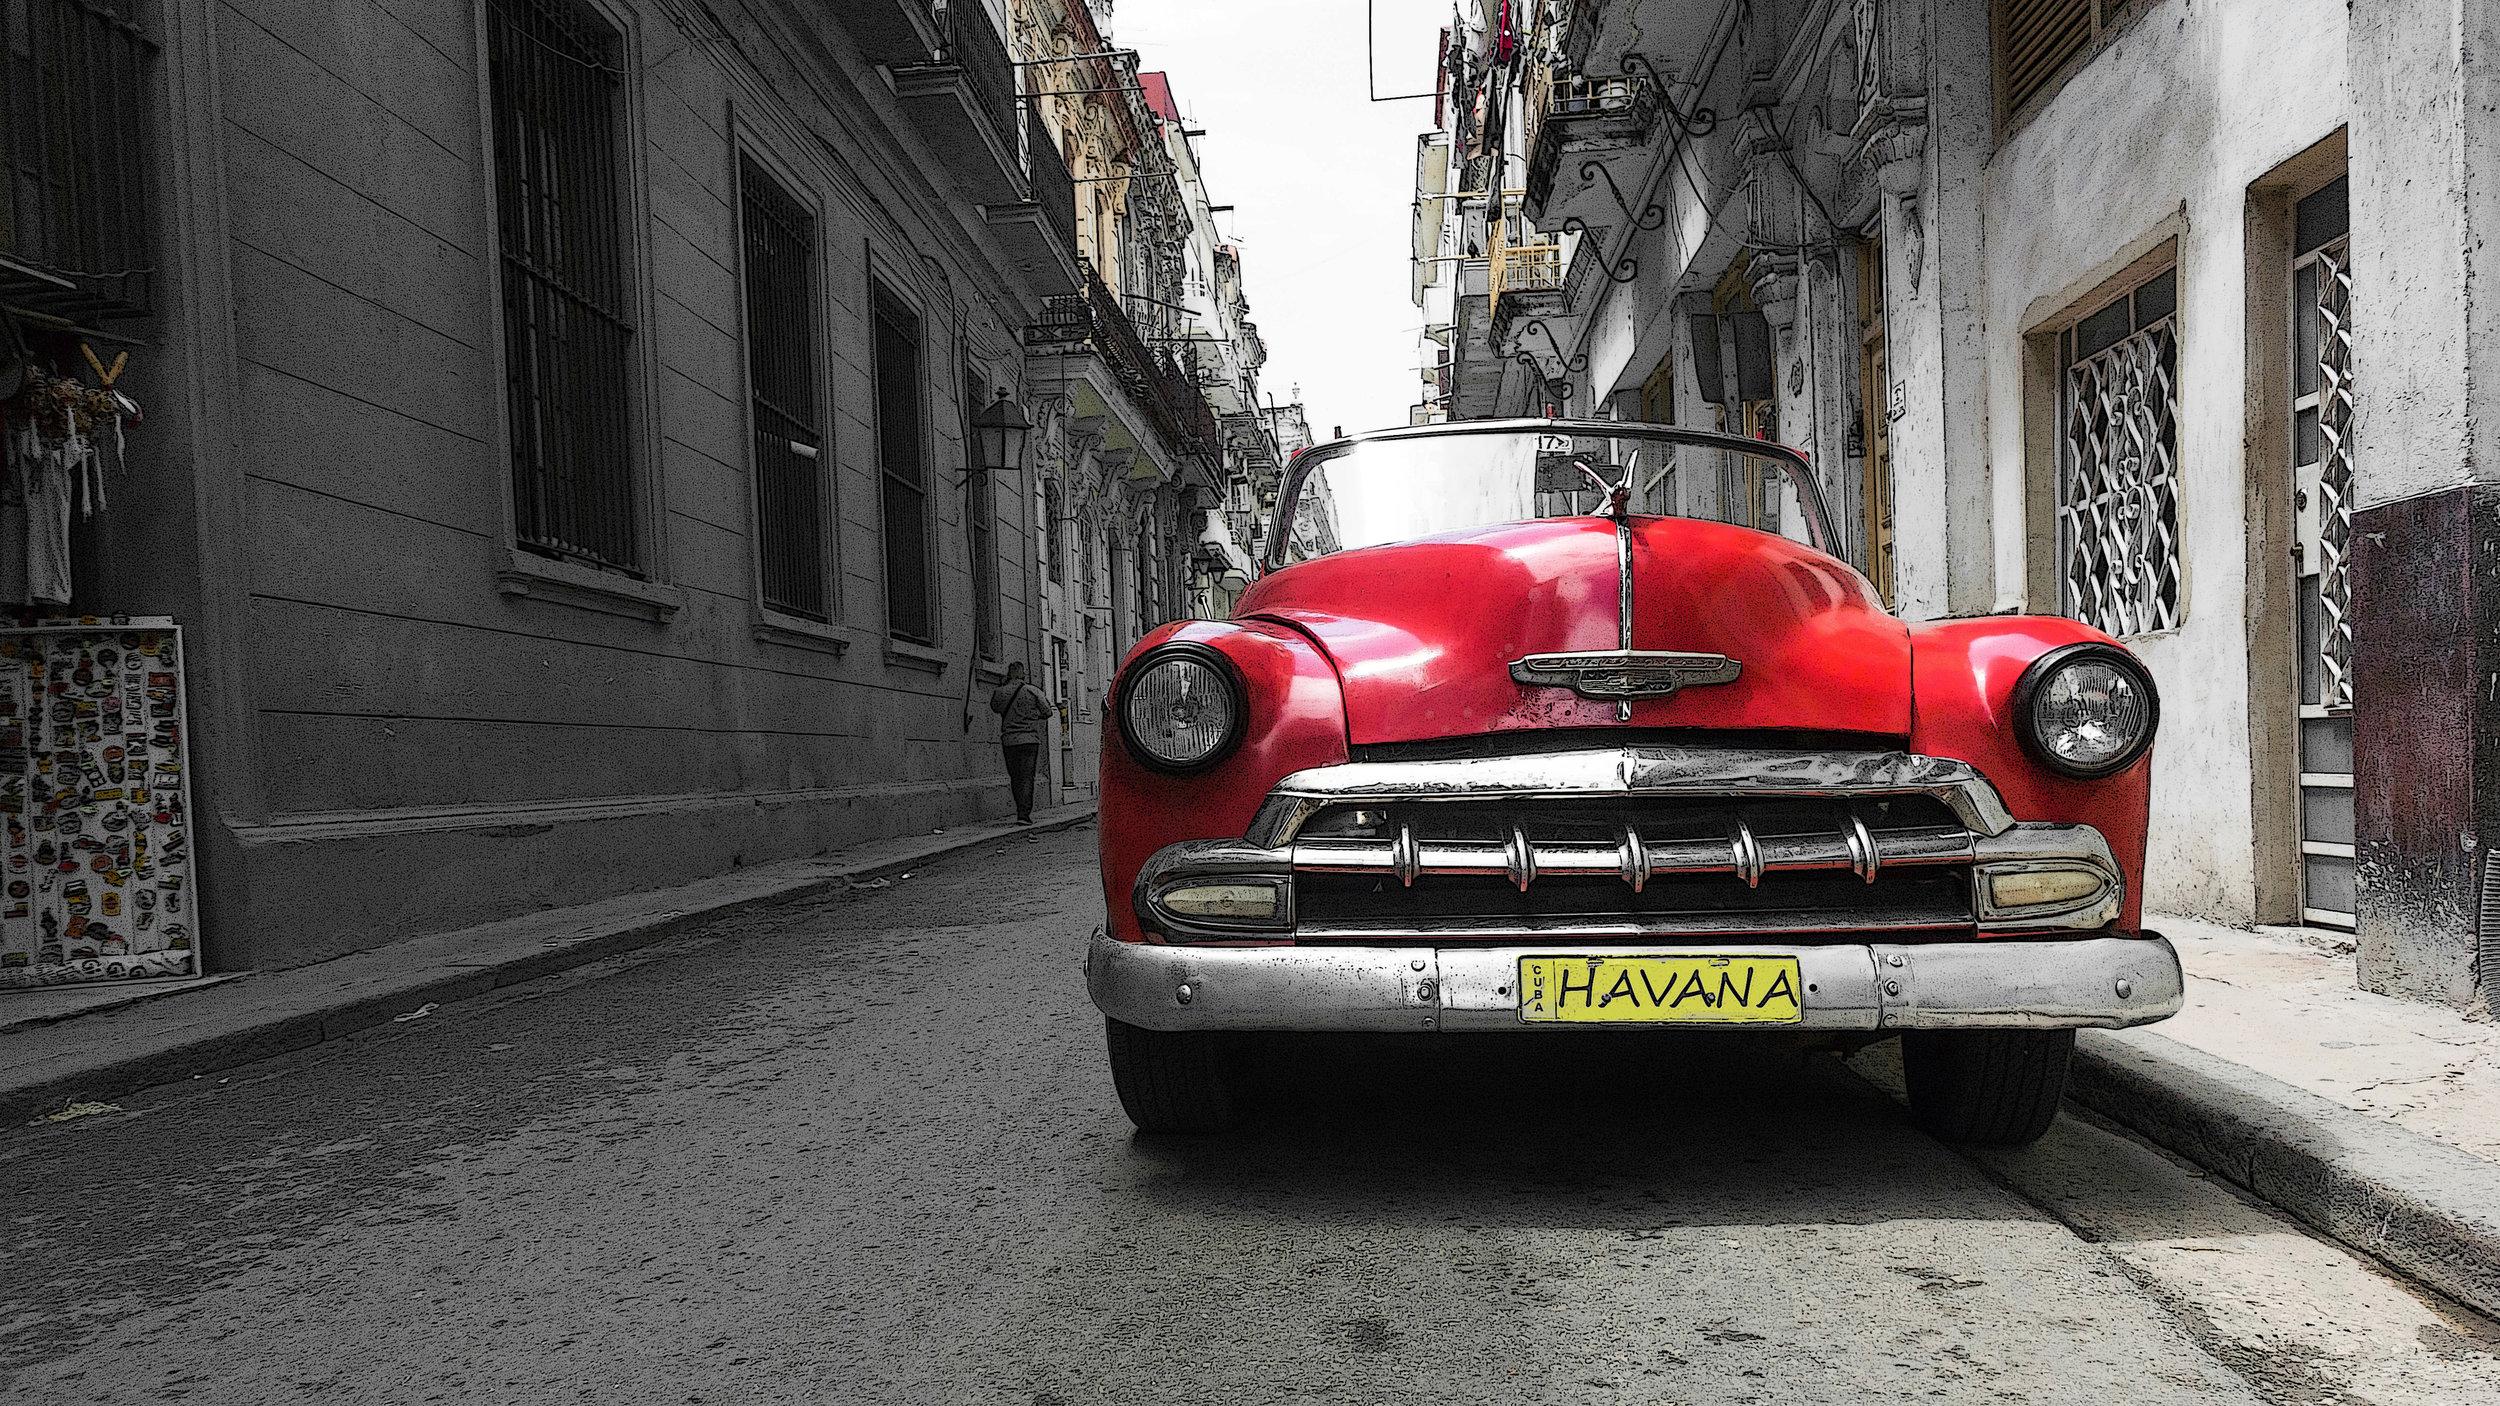 @vlkaiser.photography - Havana, Cuba